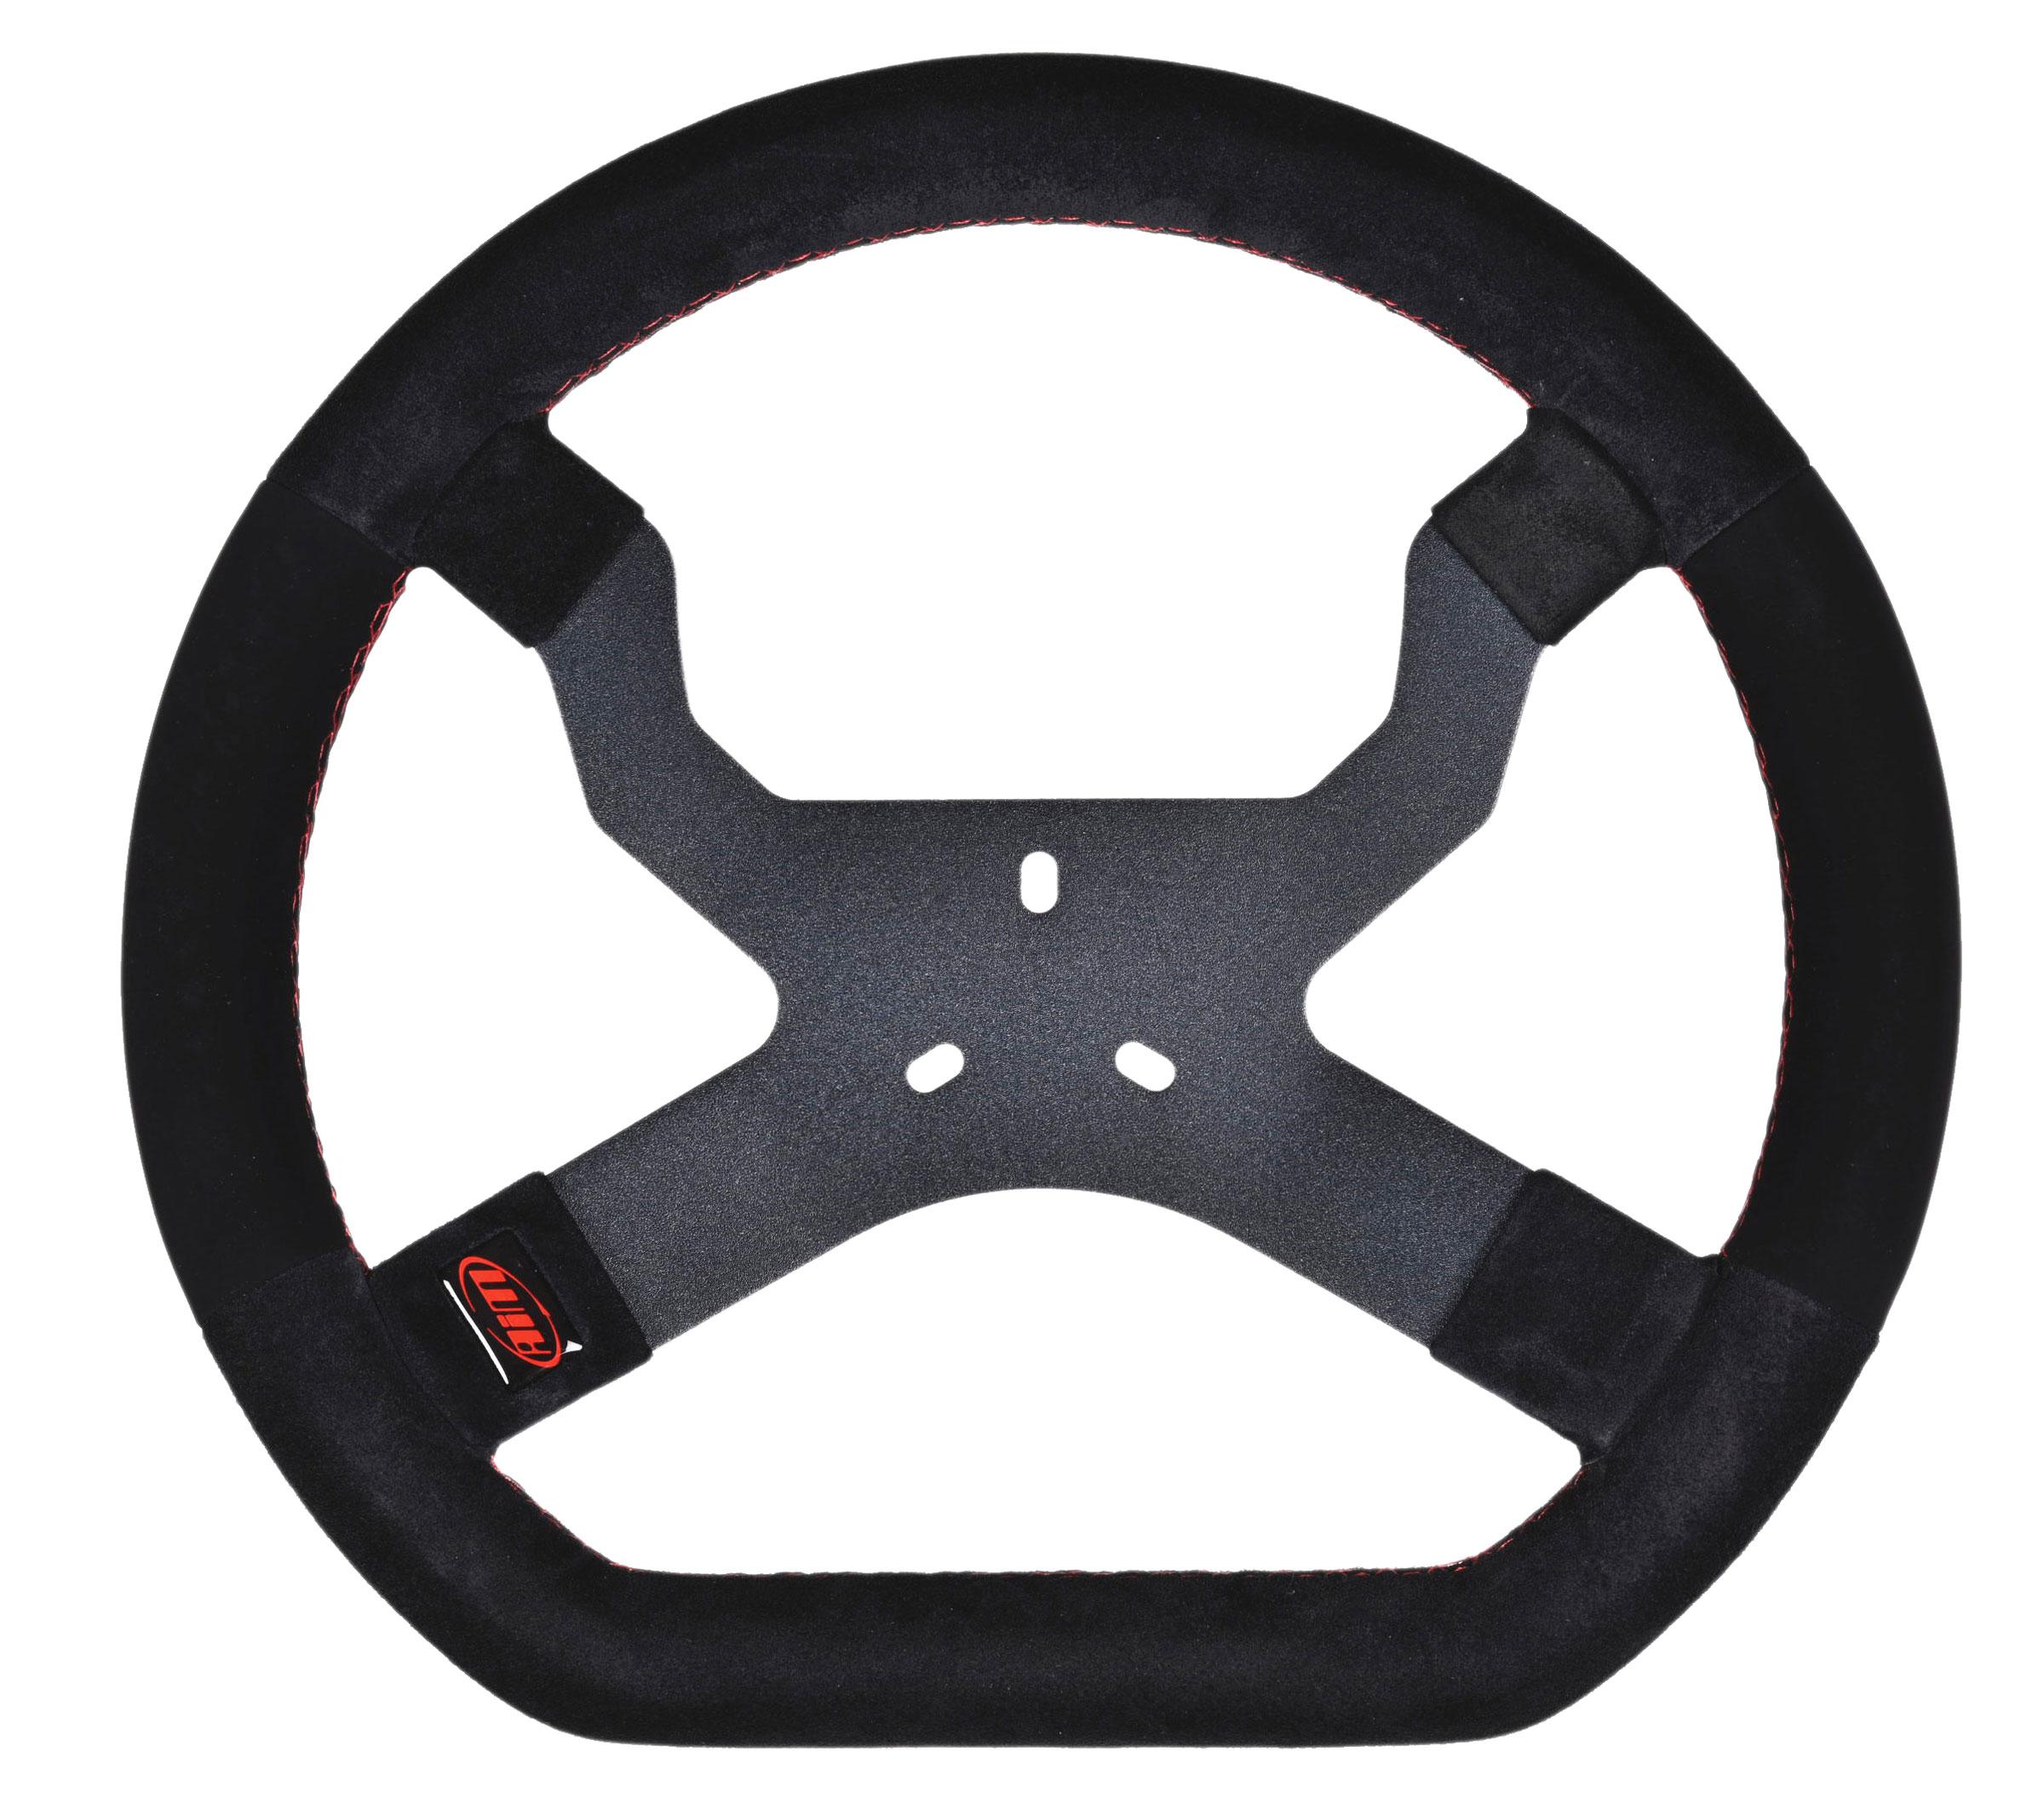 Mychron 5 Steering Wheel | 600679 | AIM Sports MC5SW | BMI Karts And ...